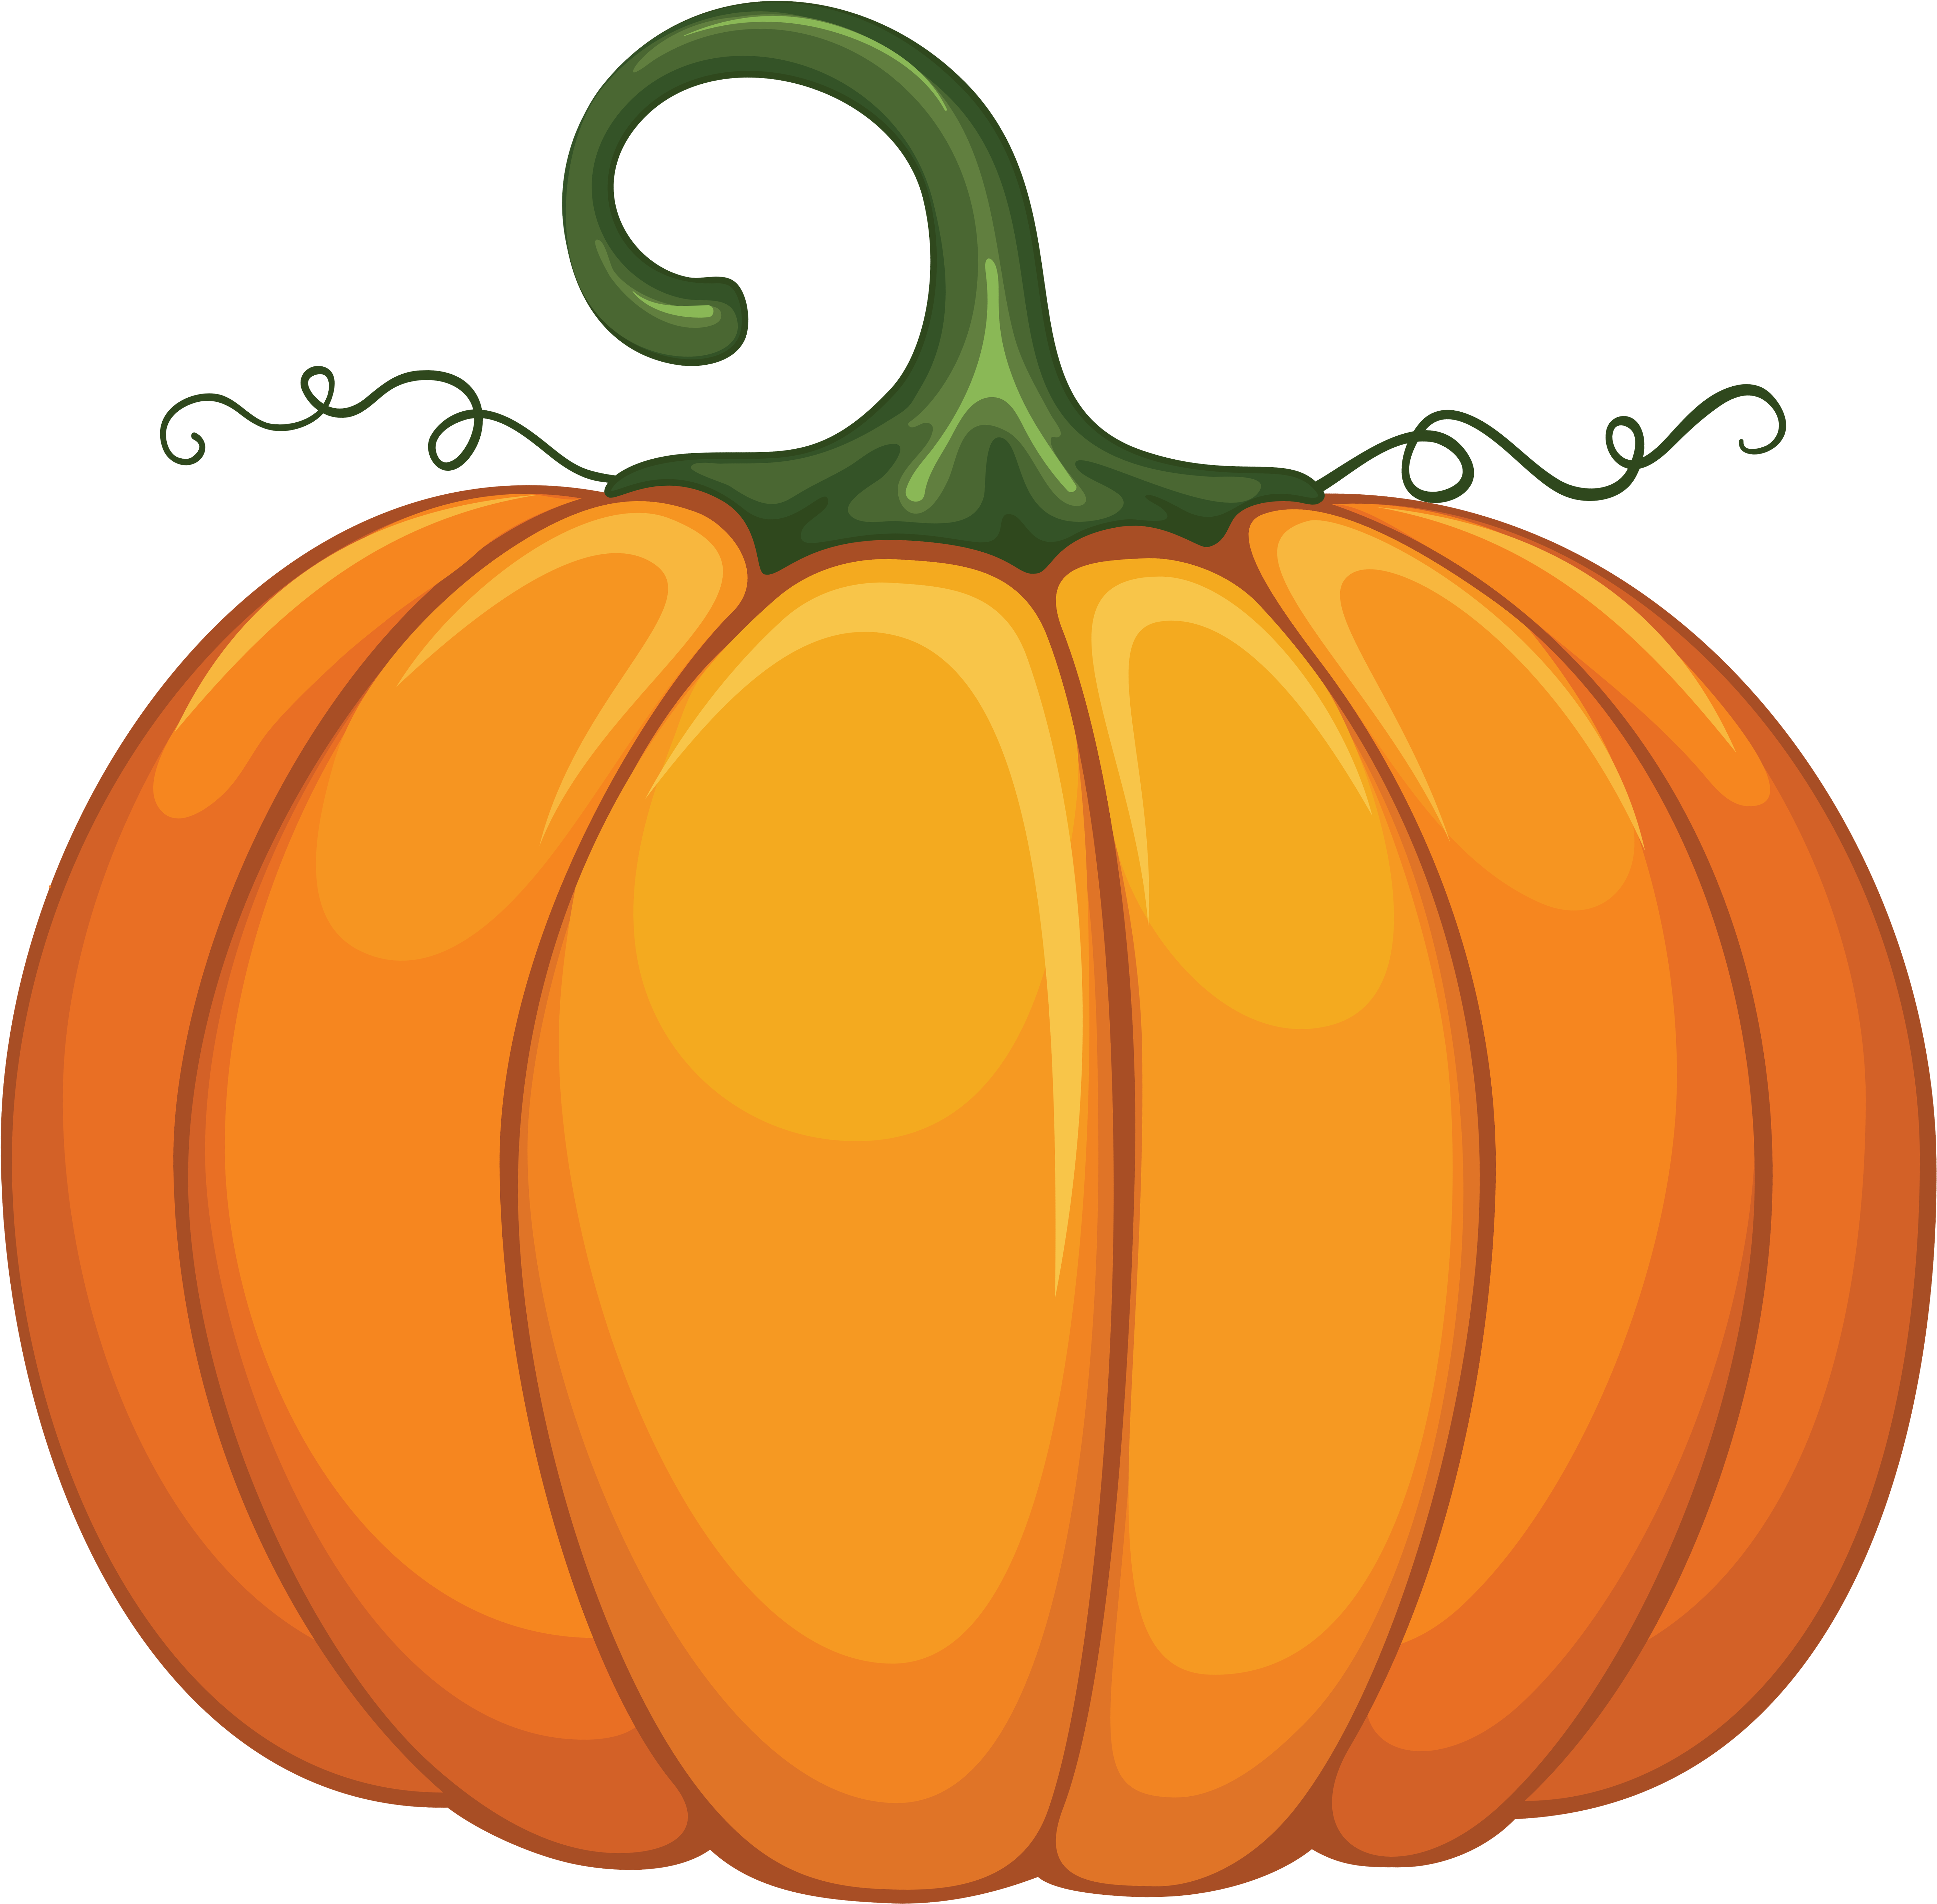 jpg stock Pumpkin clipart. Jack o lantern png